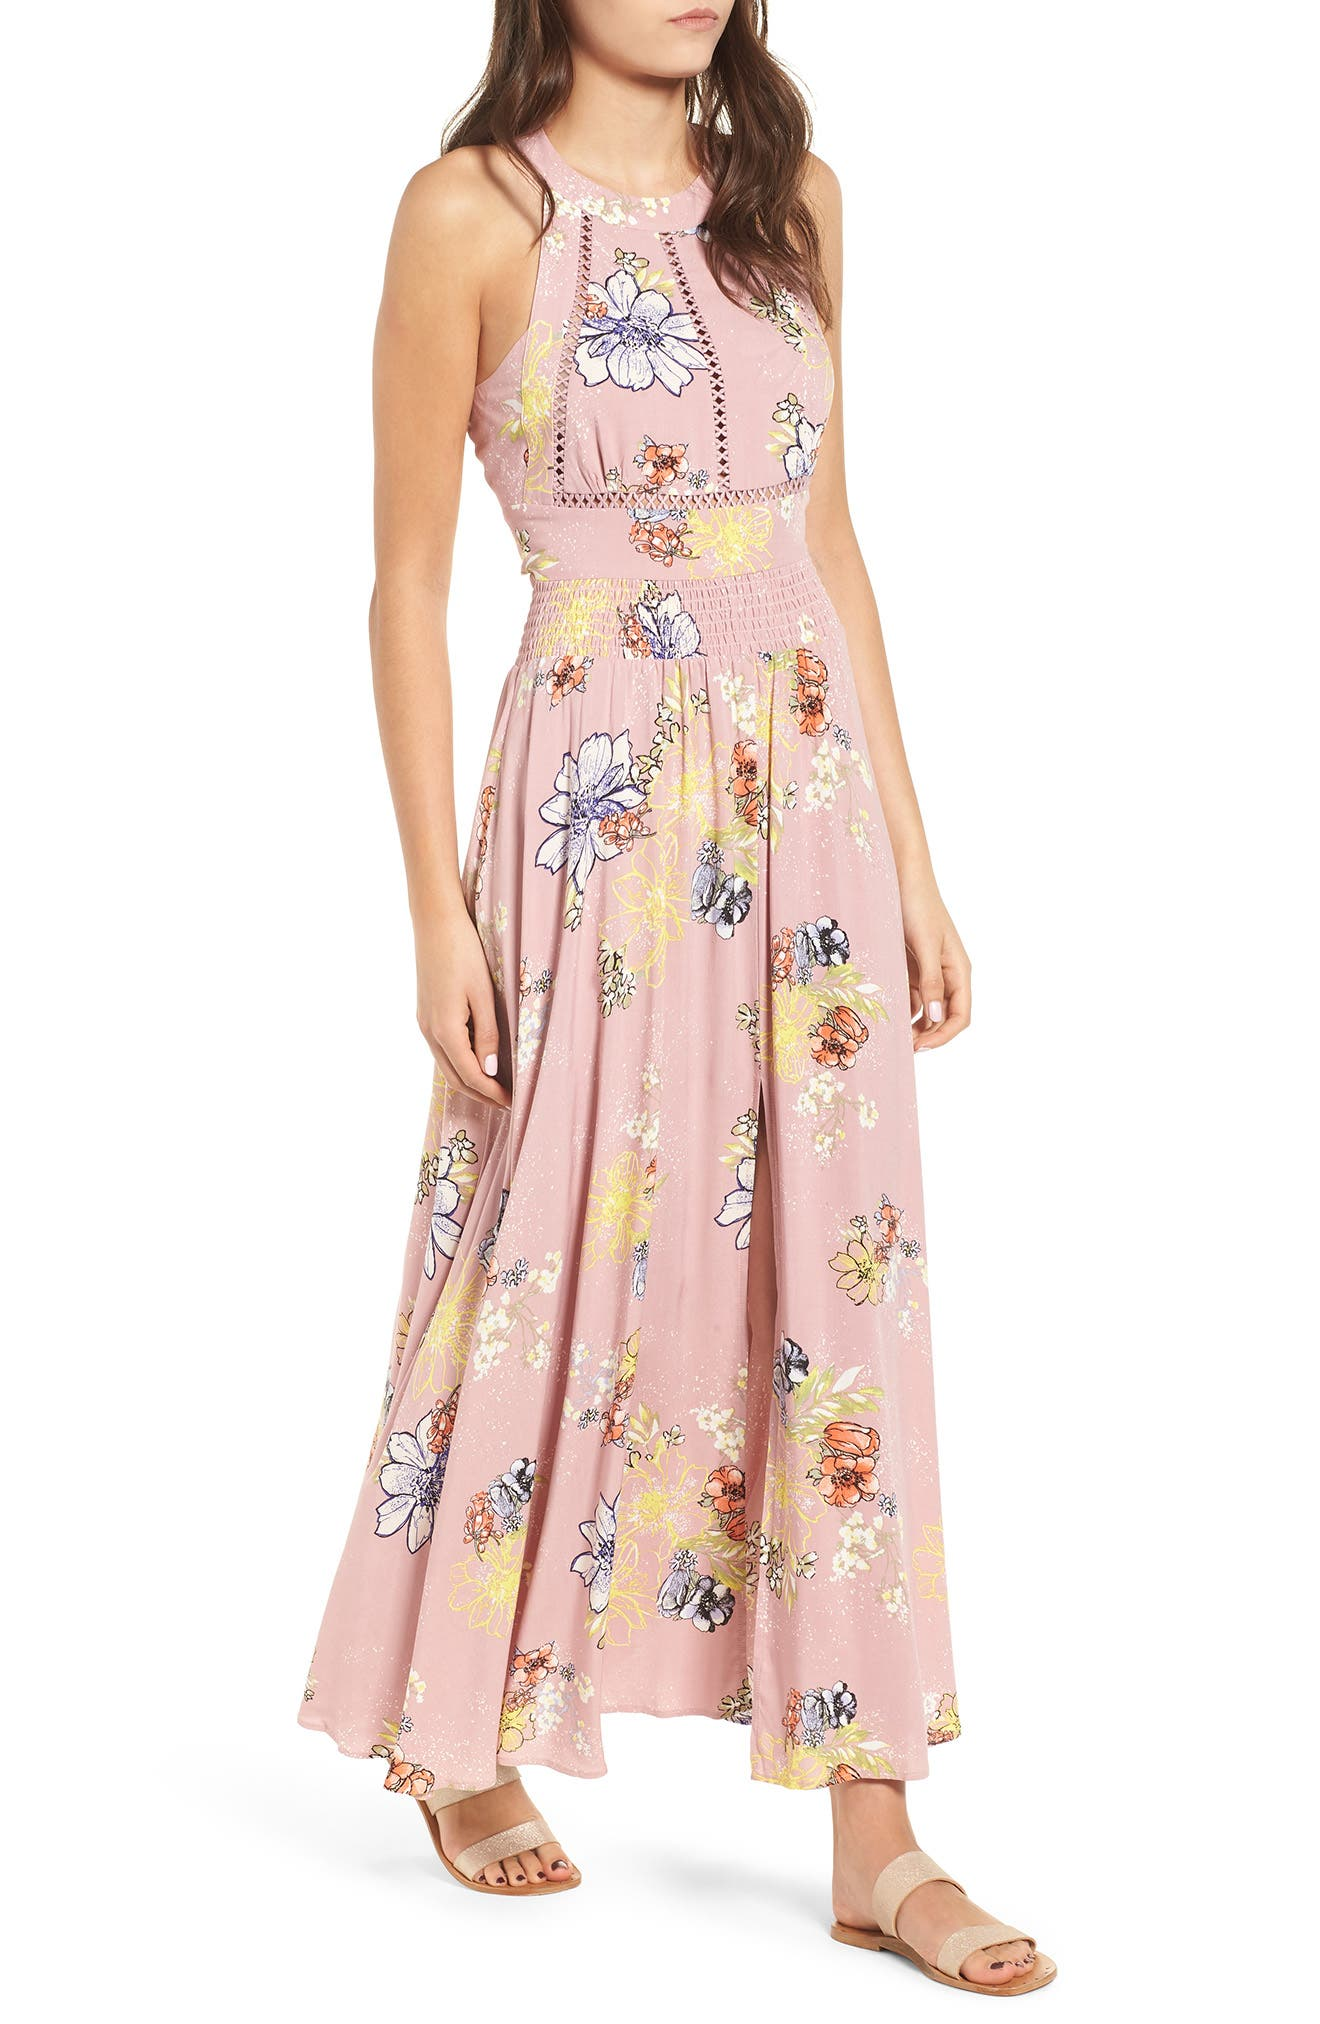 Floral Print Halter Maxi Dress,                             Main thumbnail 1, color,                             PINK EGRET ABSTRACT FLORAL